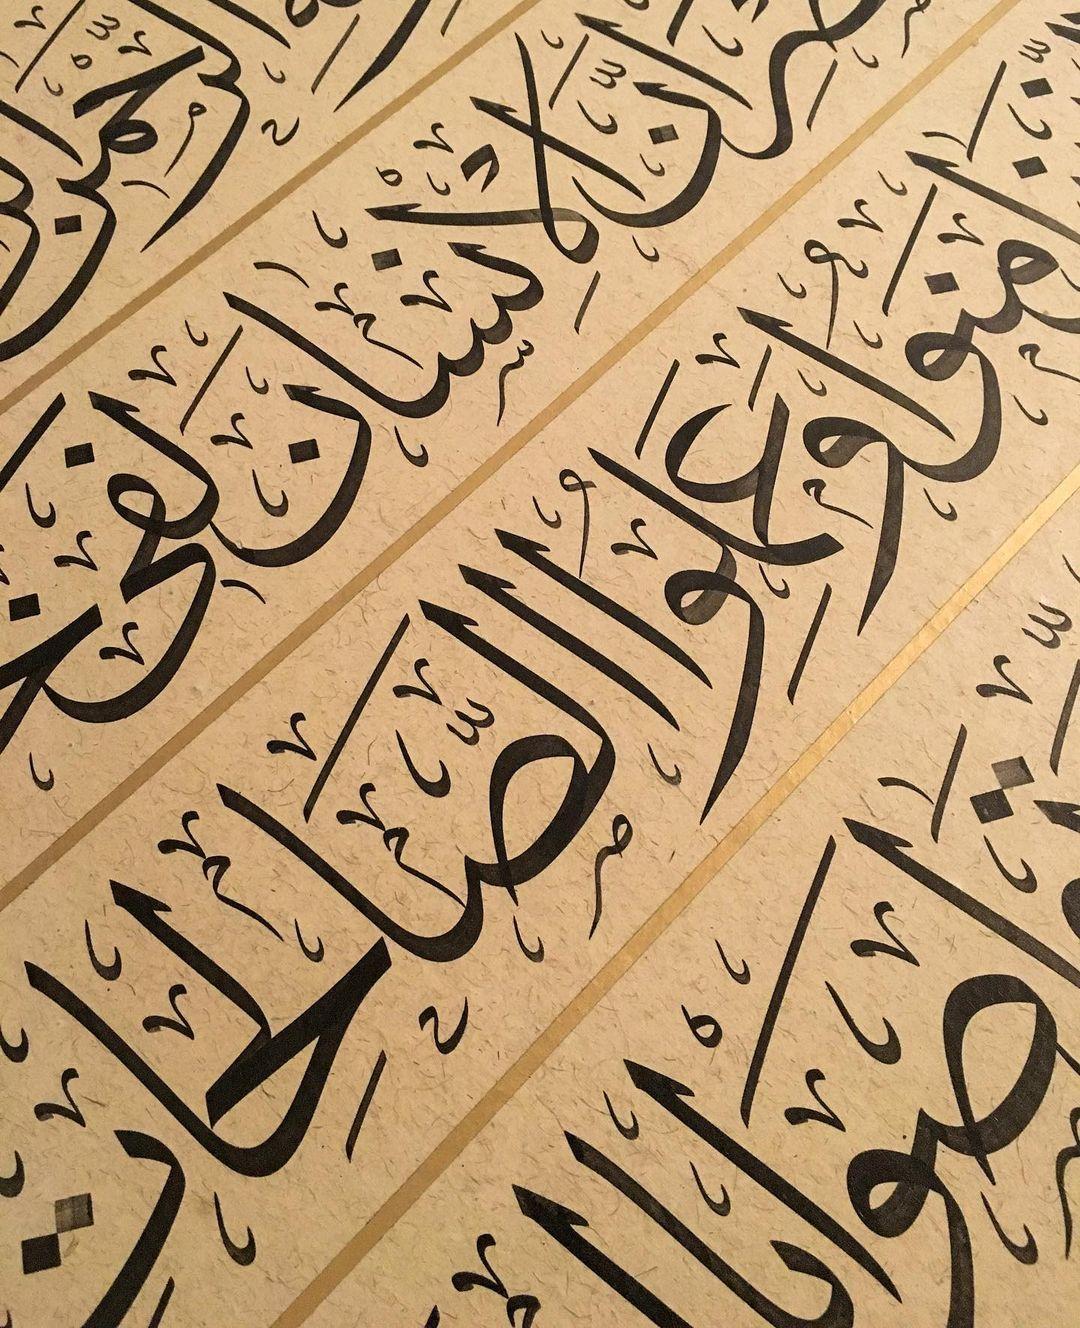 Donwload Photo Kaligrafi Detay #hat #hatsanatı #calligraphy #art #calligrapher #tasarım #islamic #sanat…- Osman Ozcay